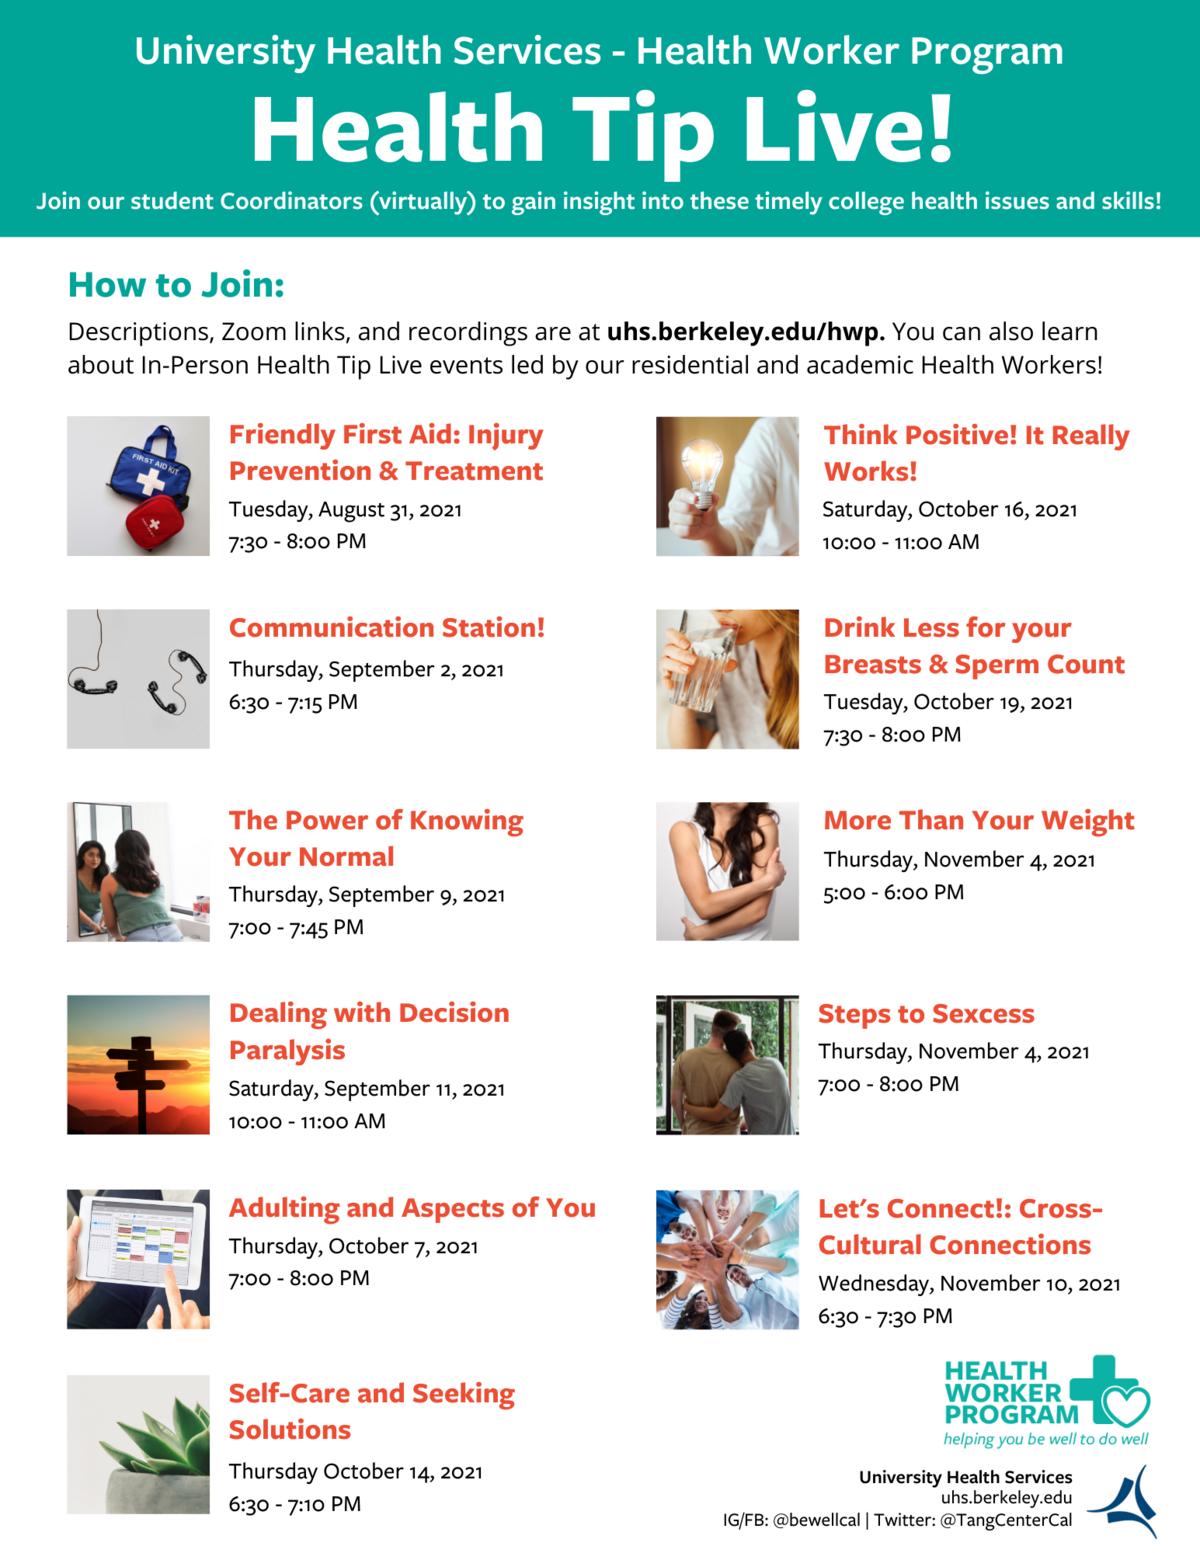 Fall 2021 Health Tip Live Schedule